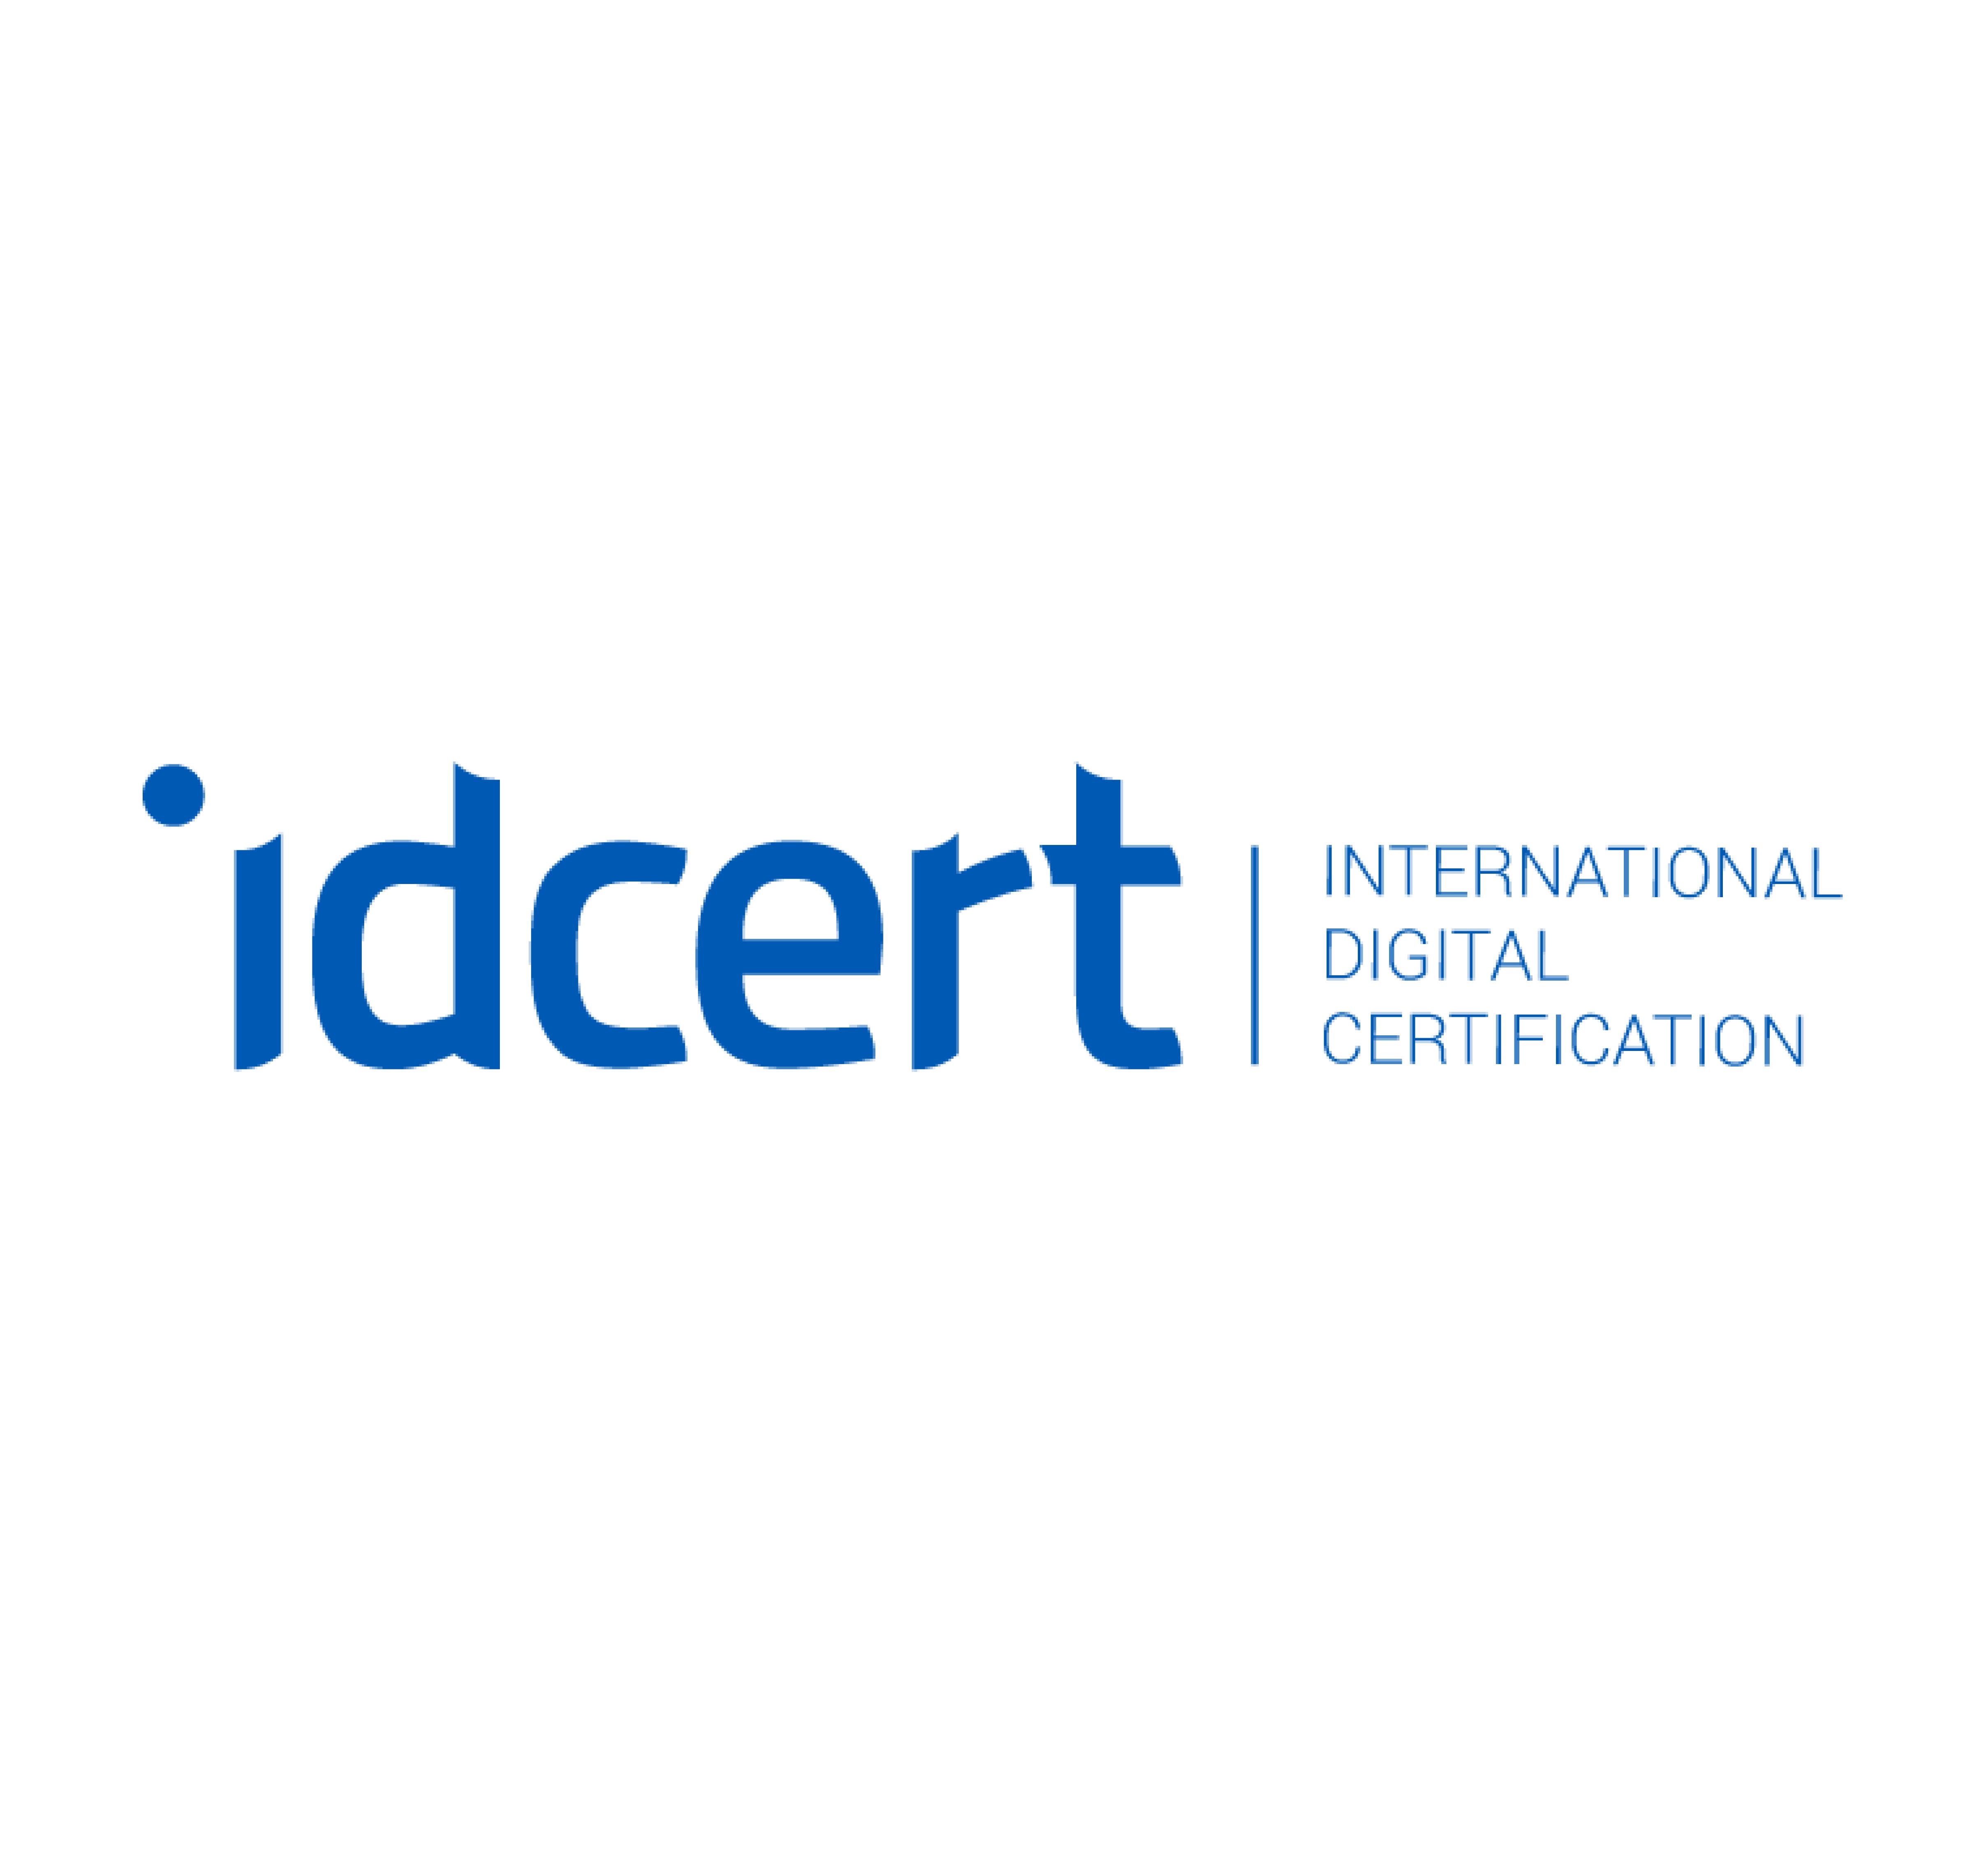 idcert_logo_sito_bianco